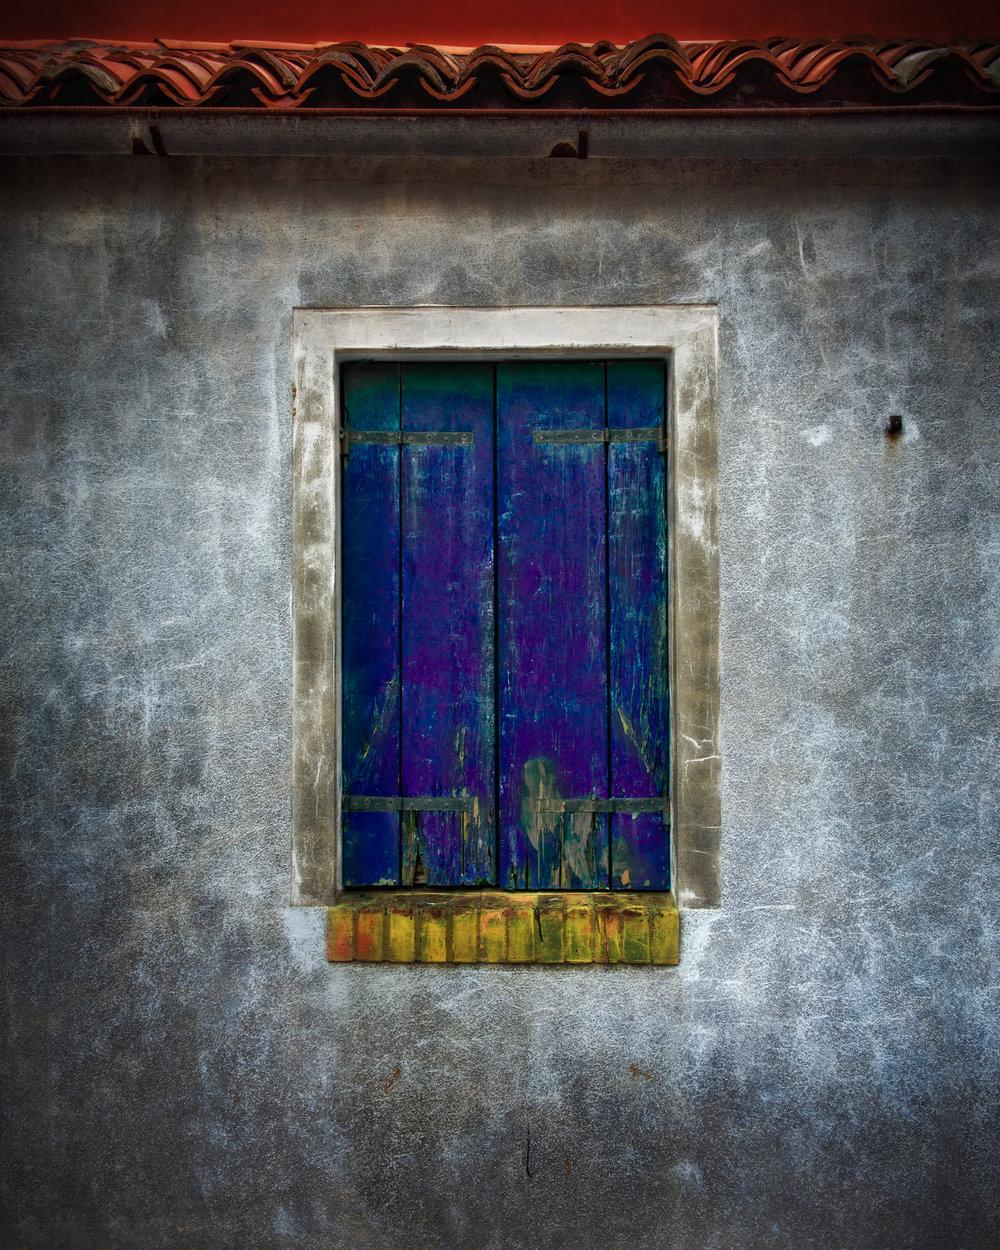 Window #2